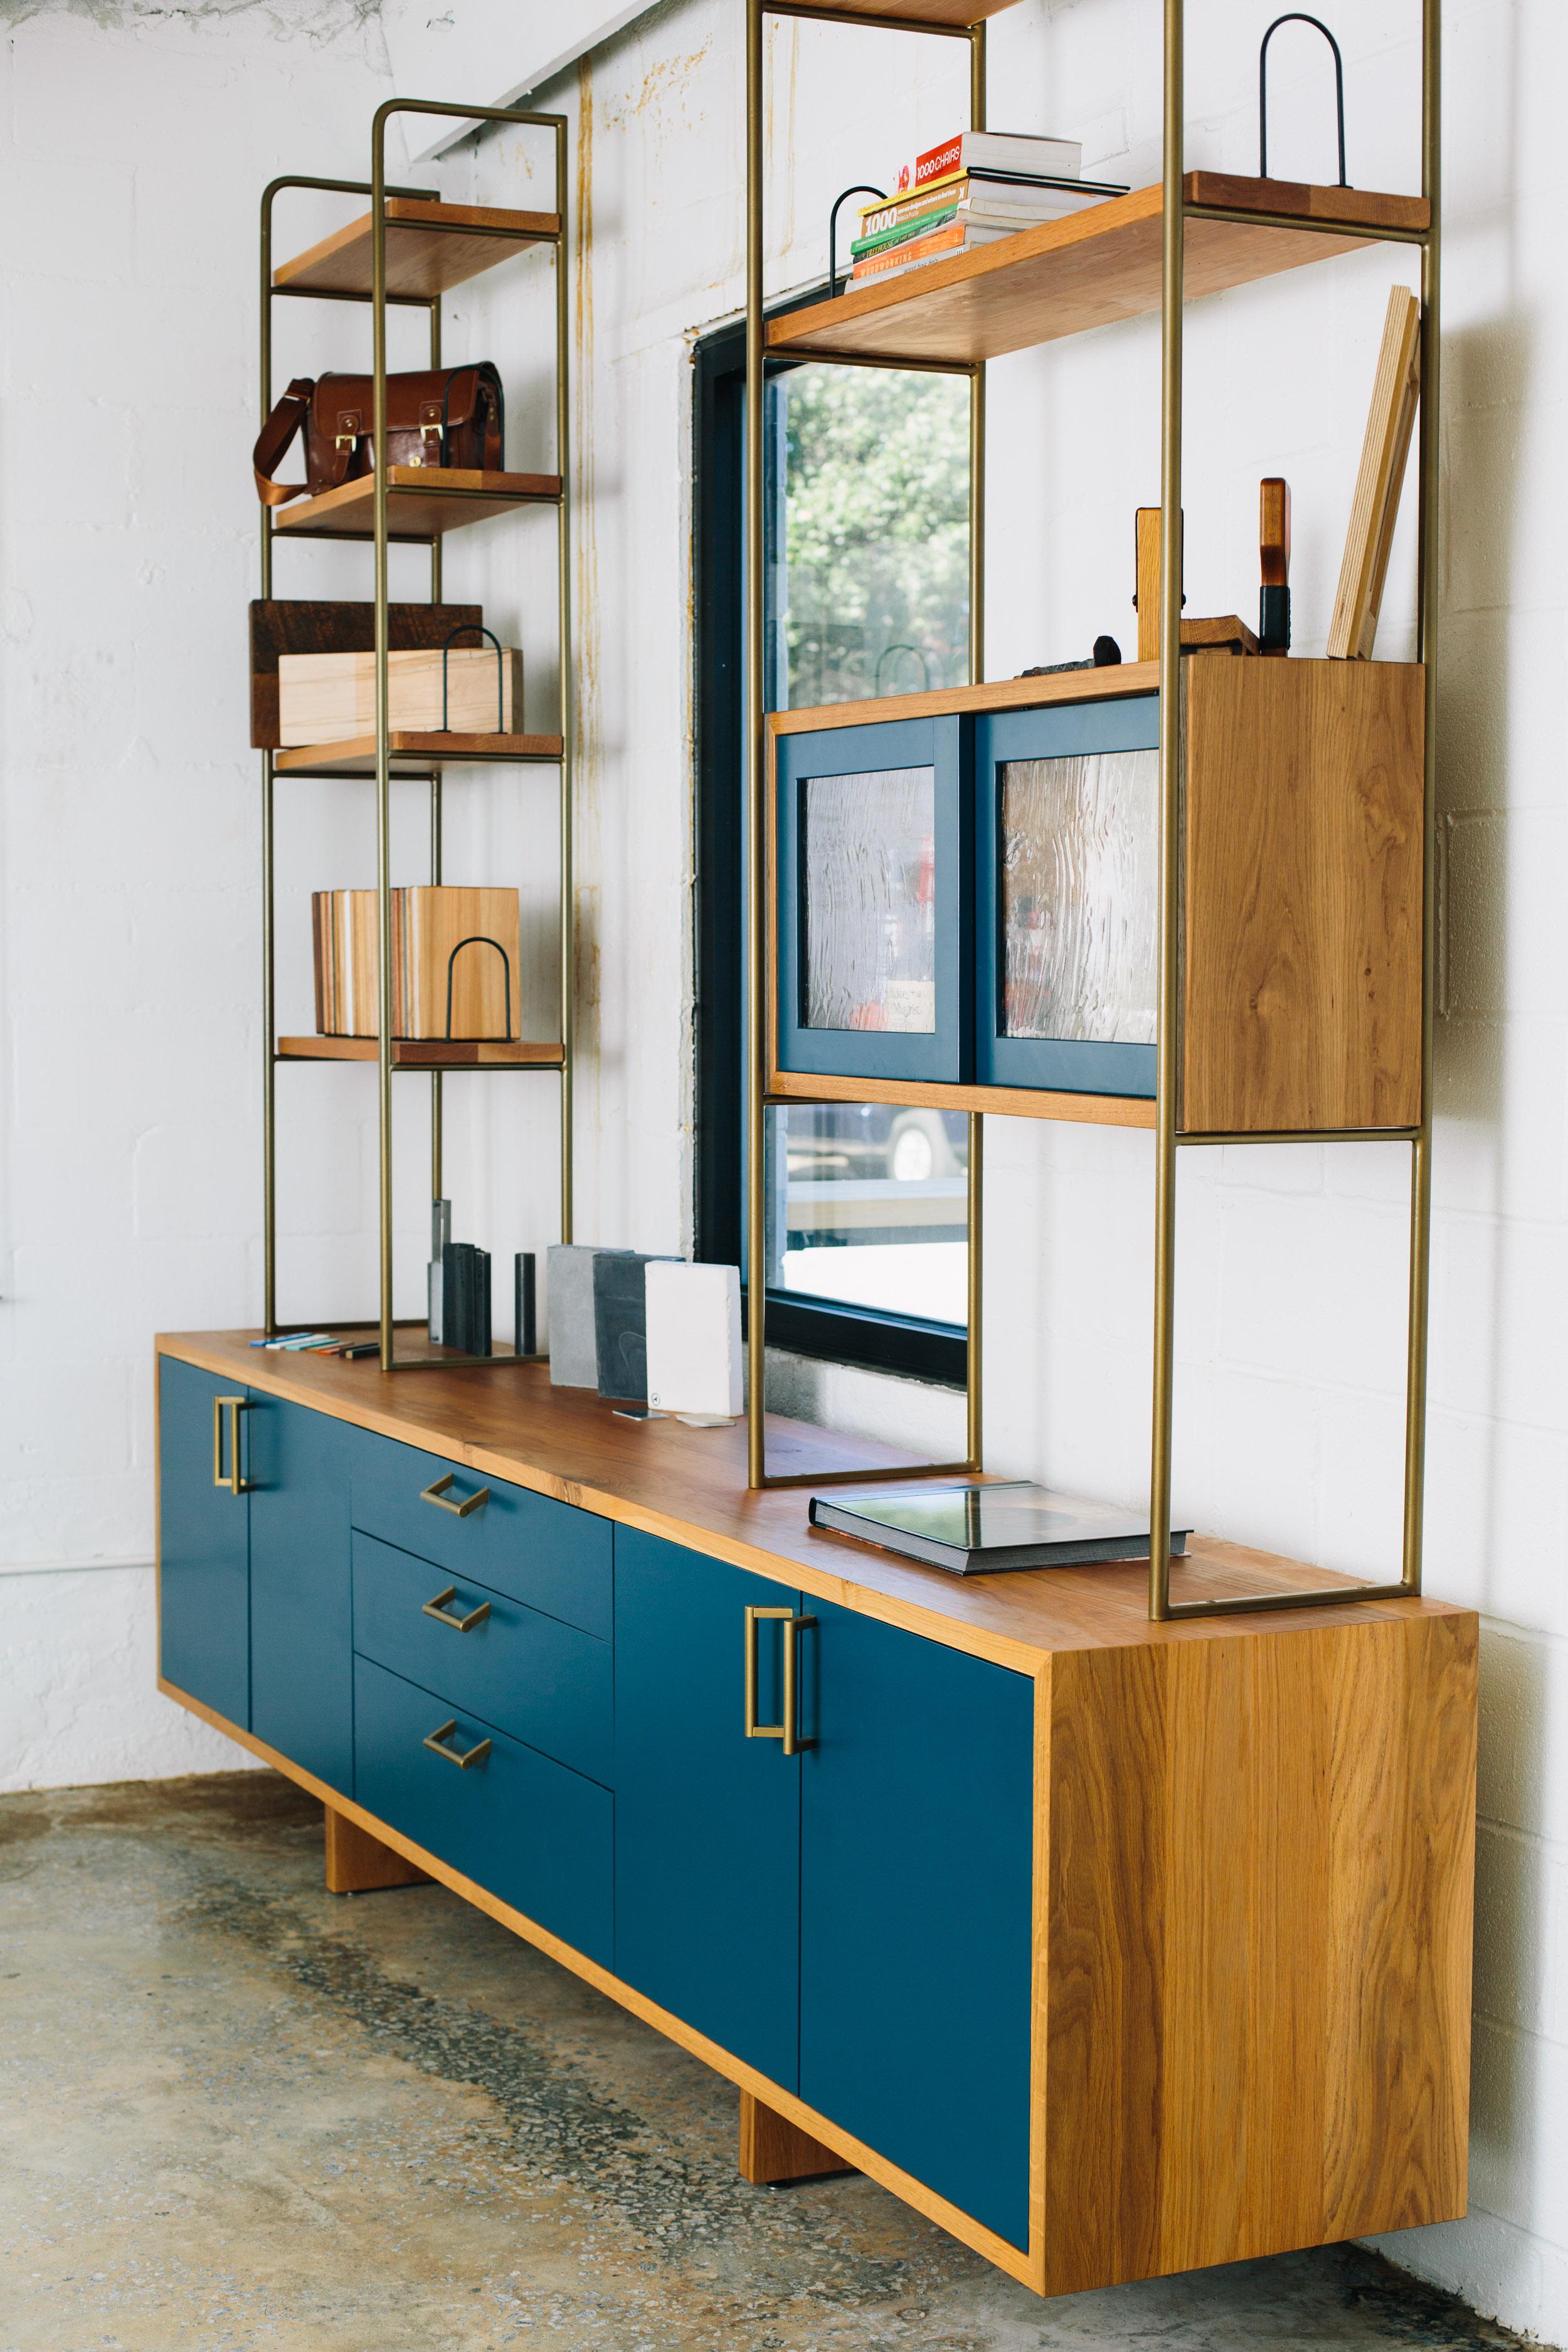 b-10-showroom-8893.jpg